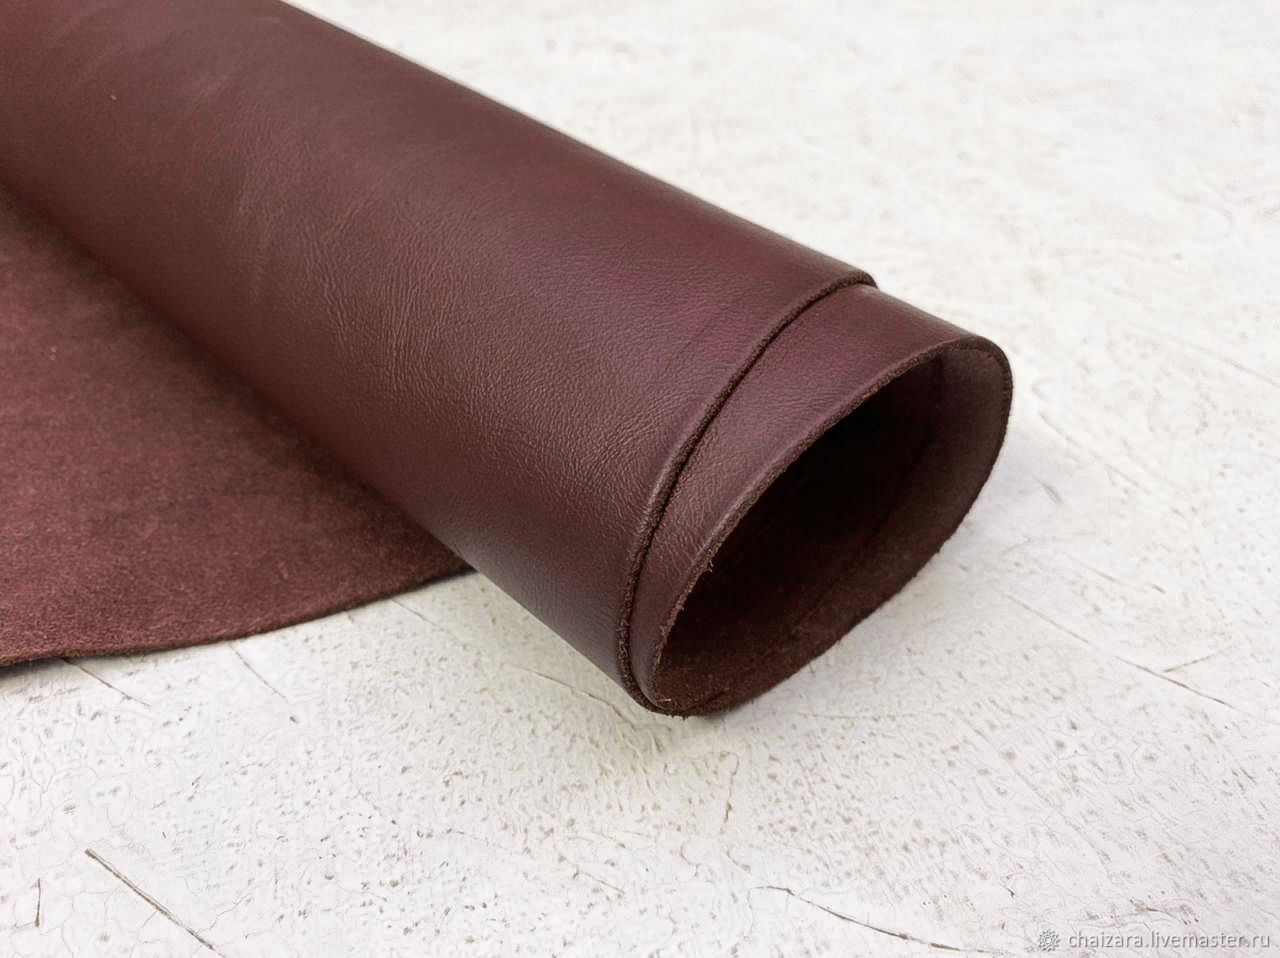 Натуральная кожа 1.2-1.4 мм Torino Bordo, Кожа, Оренбург,  Фото №1